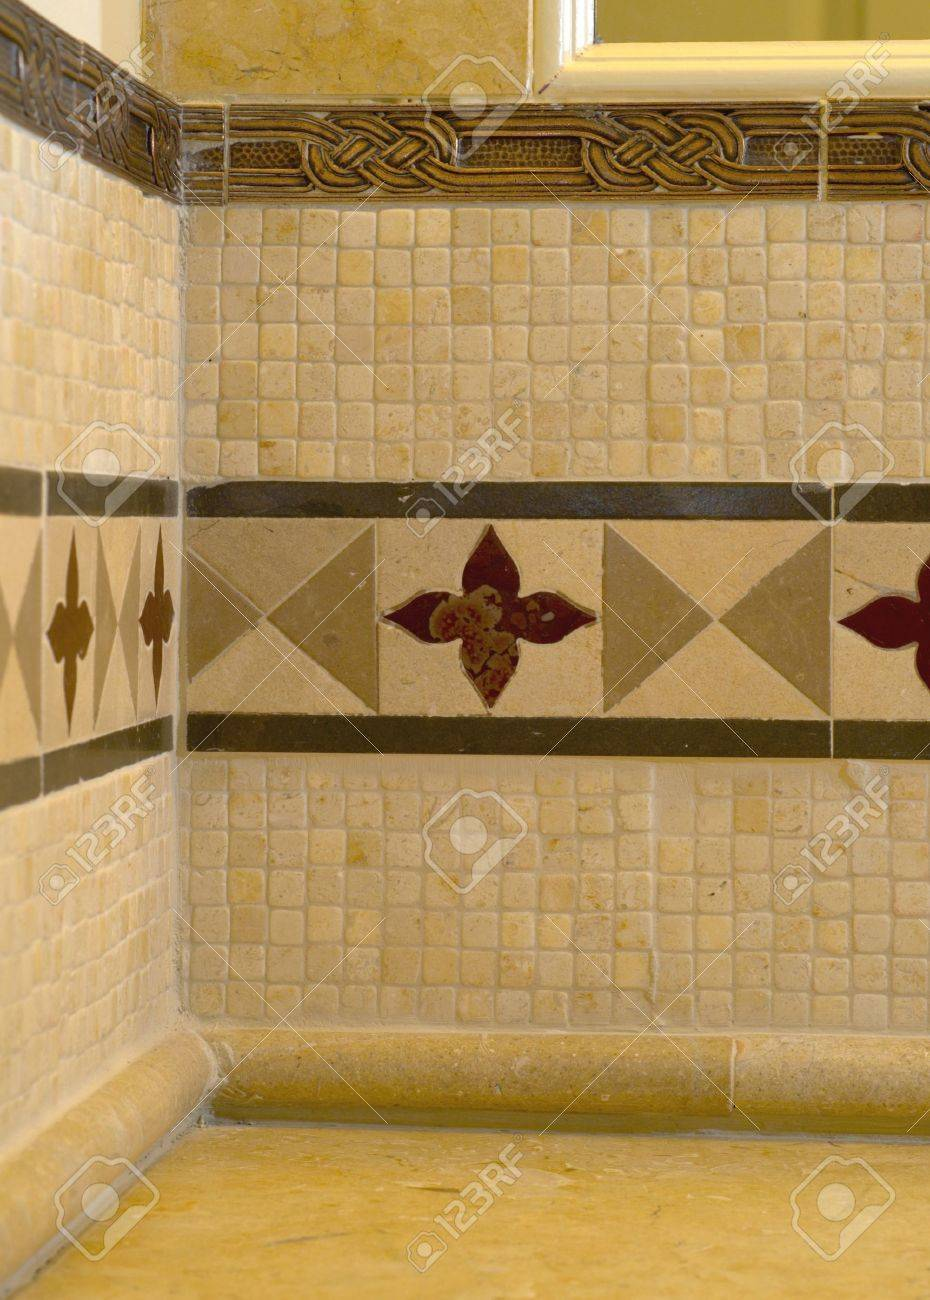 - Detail Custom Tile Work Bathroom Backsplash Wall Stock Photo